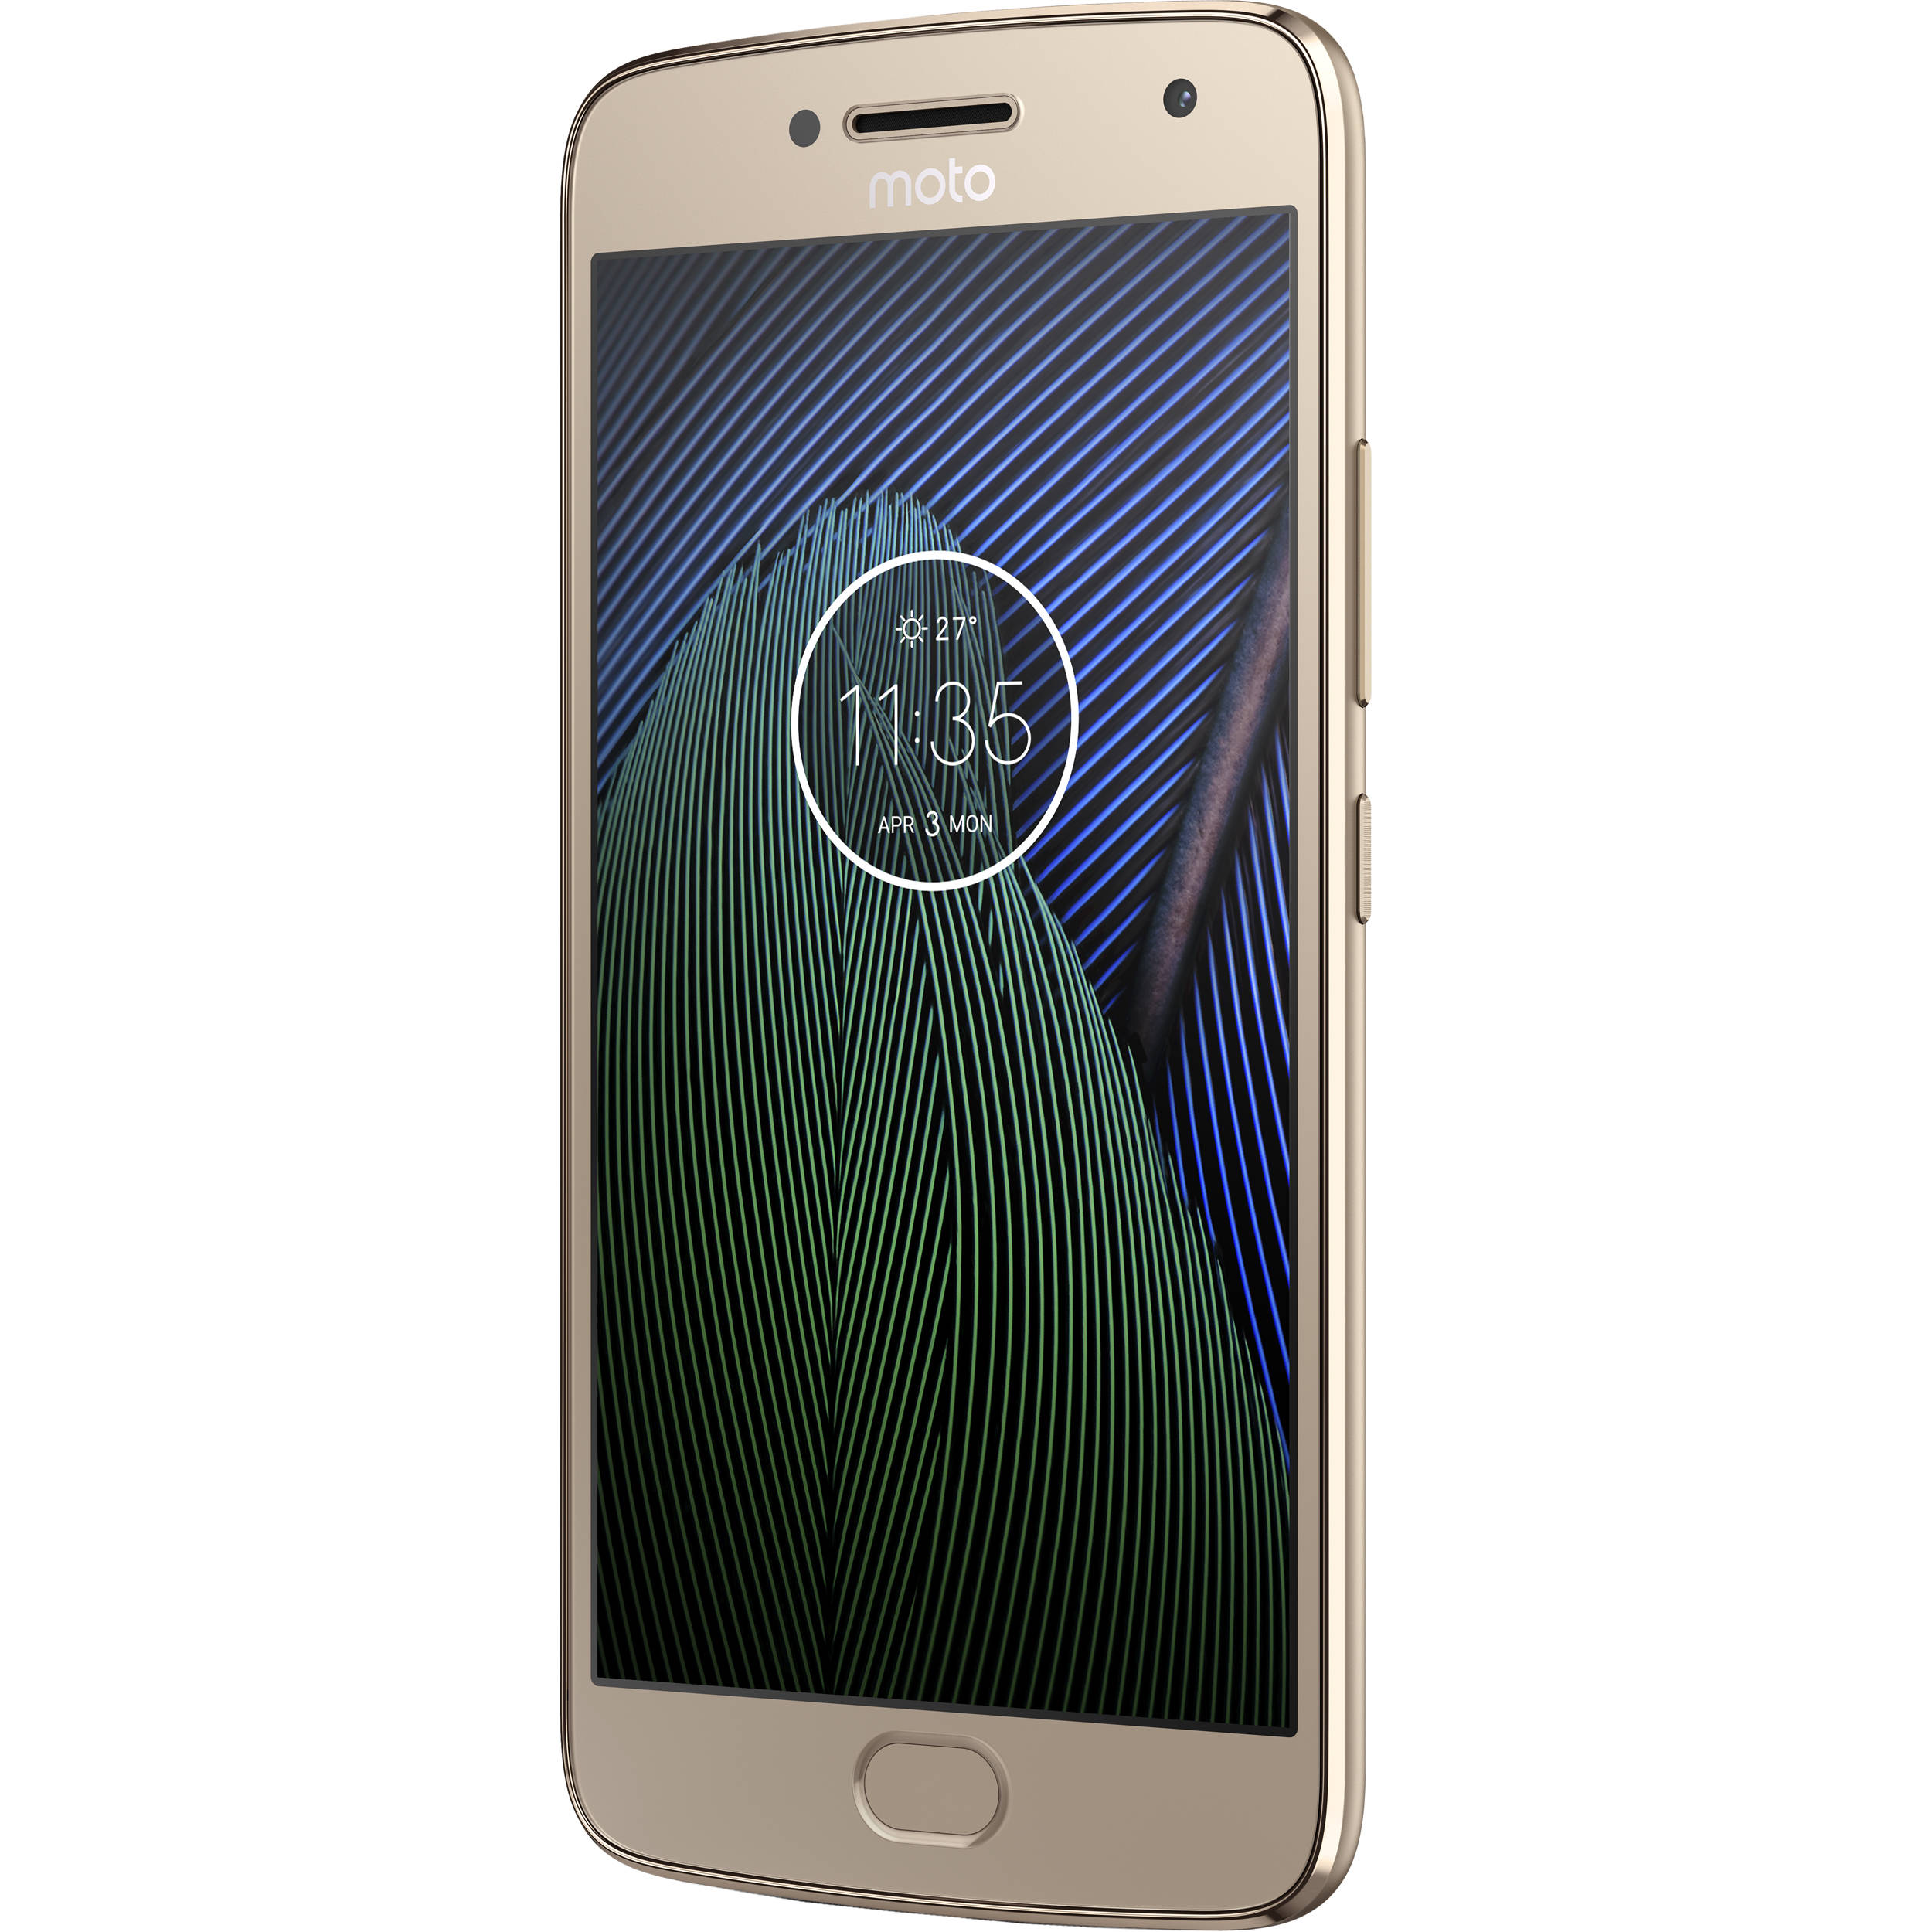 Moto Moto G5 Plus XT1687 64GB Smartphone 01109NARTL B&H Photo